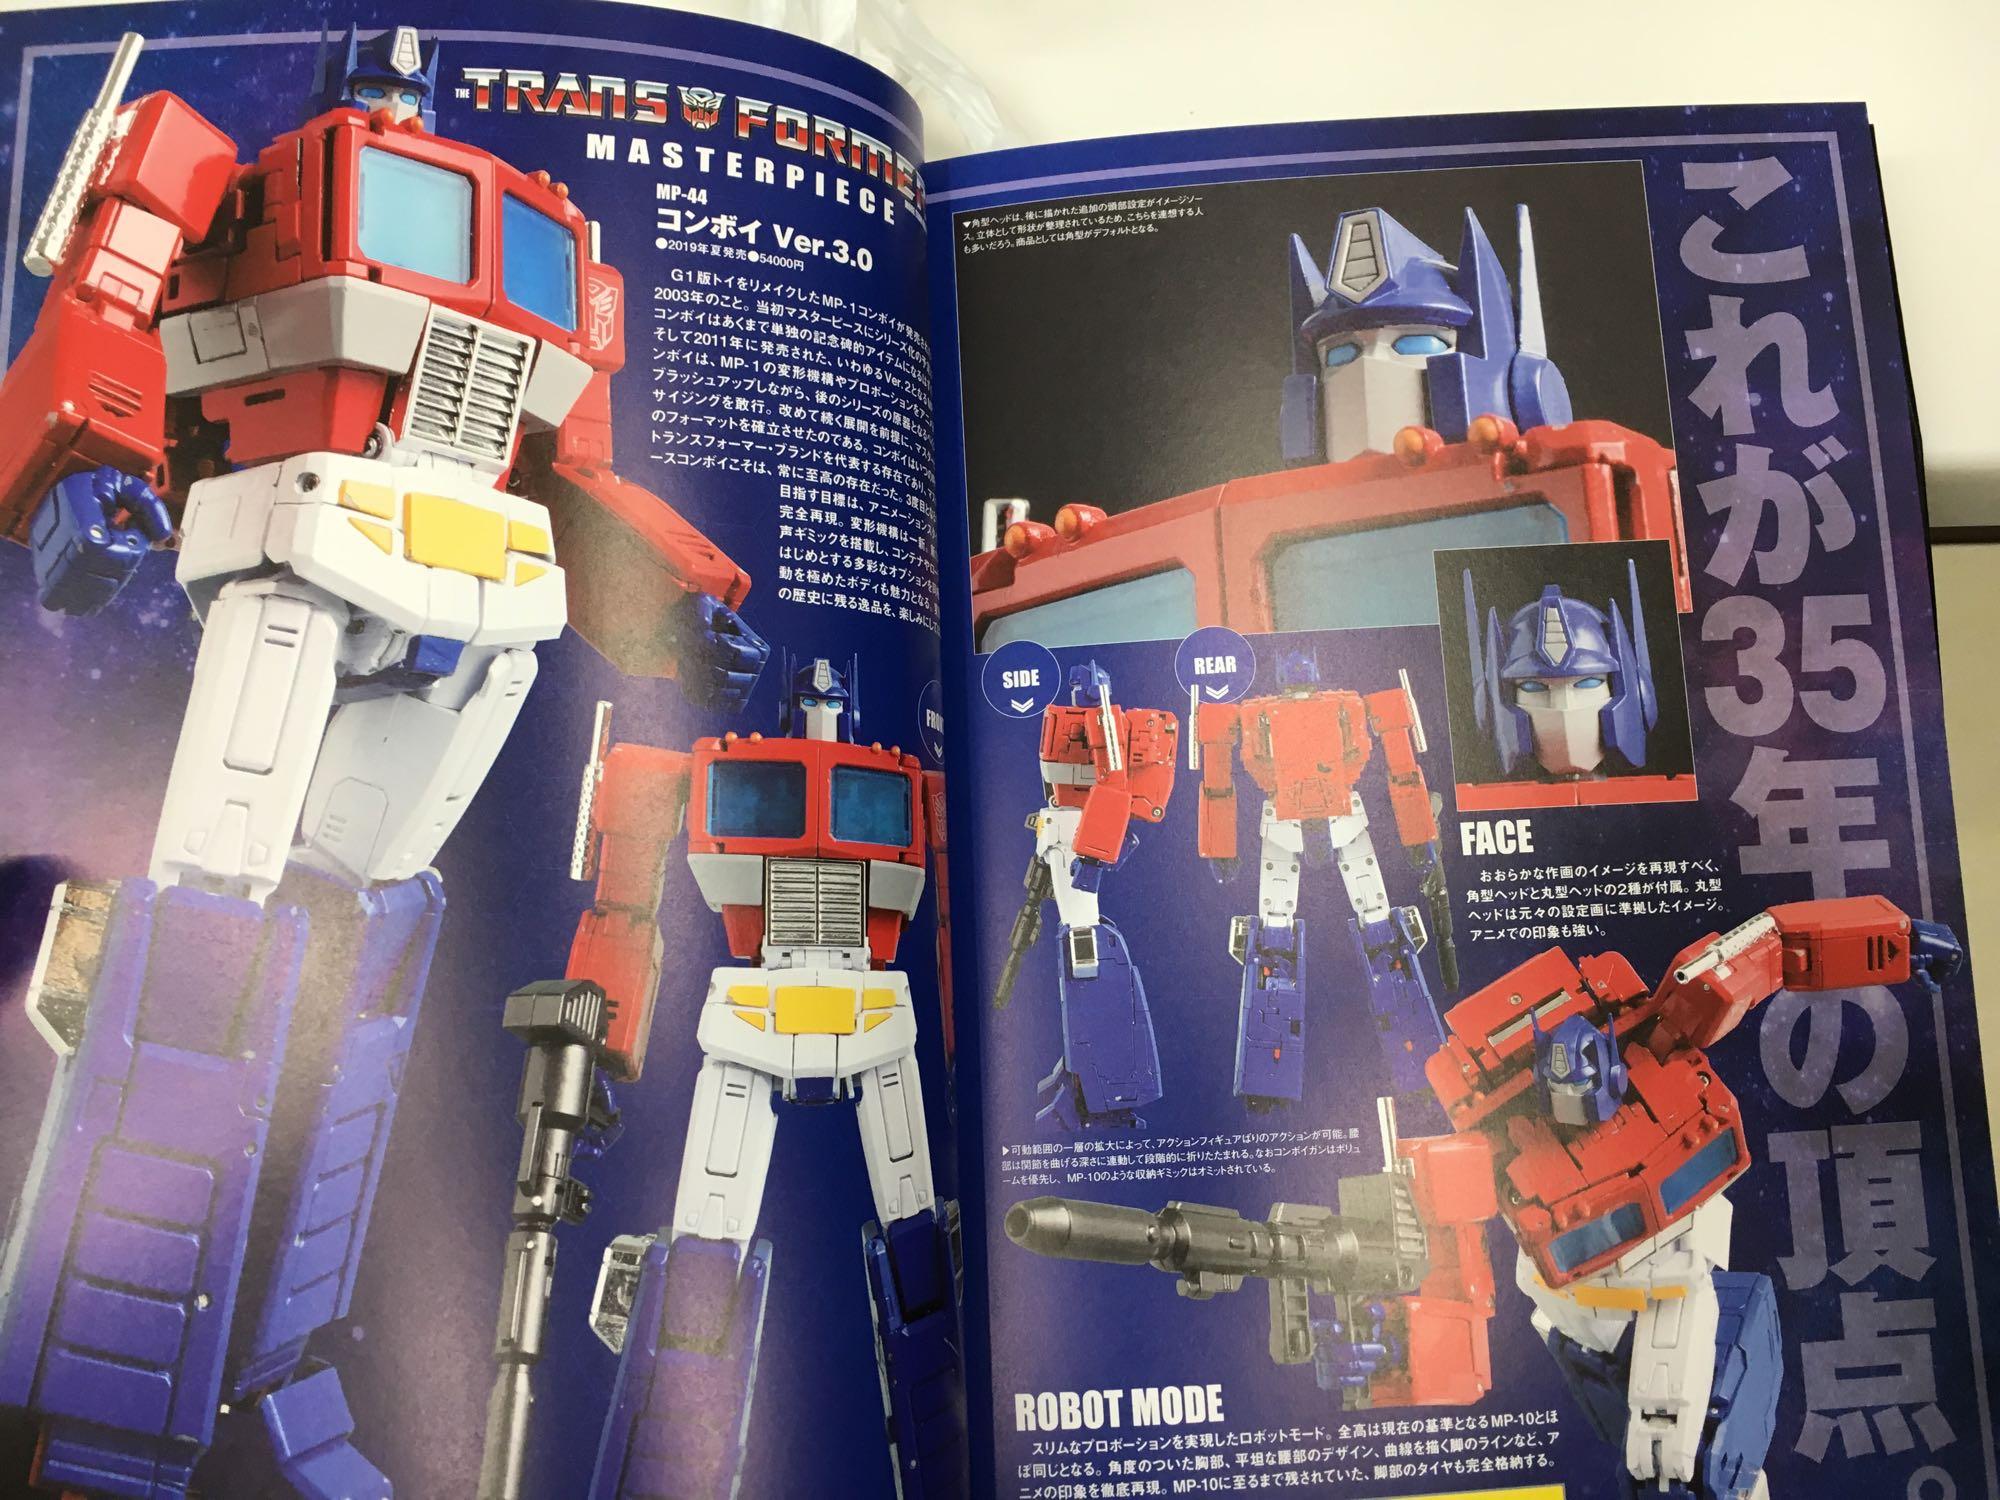 Transformers Generations Book 2019 Masterpiece MP-44